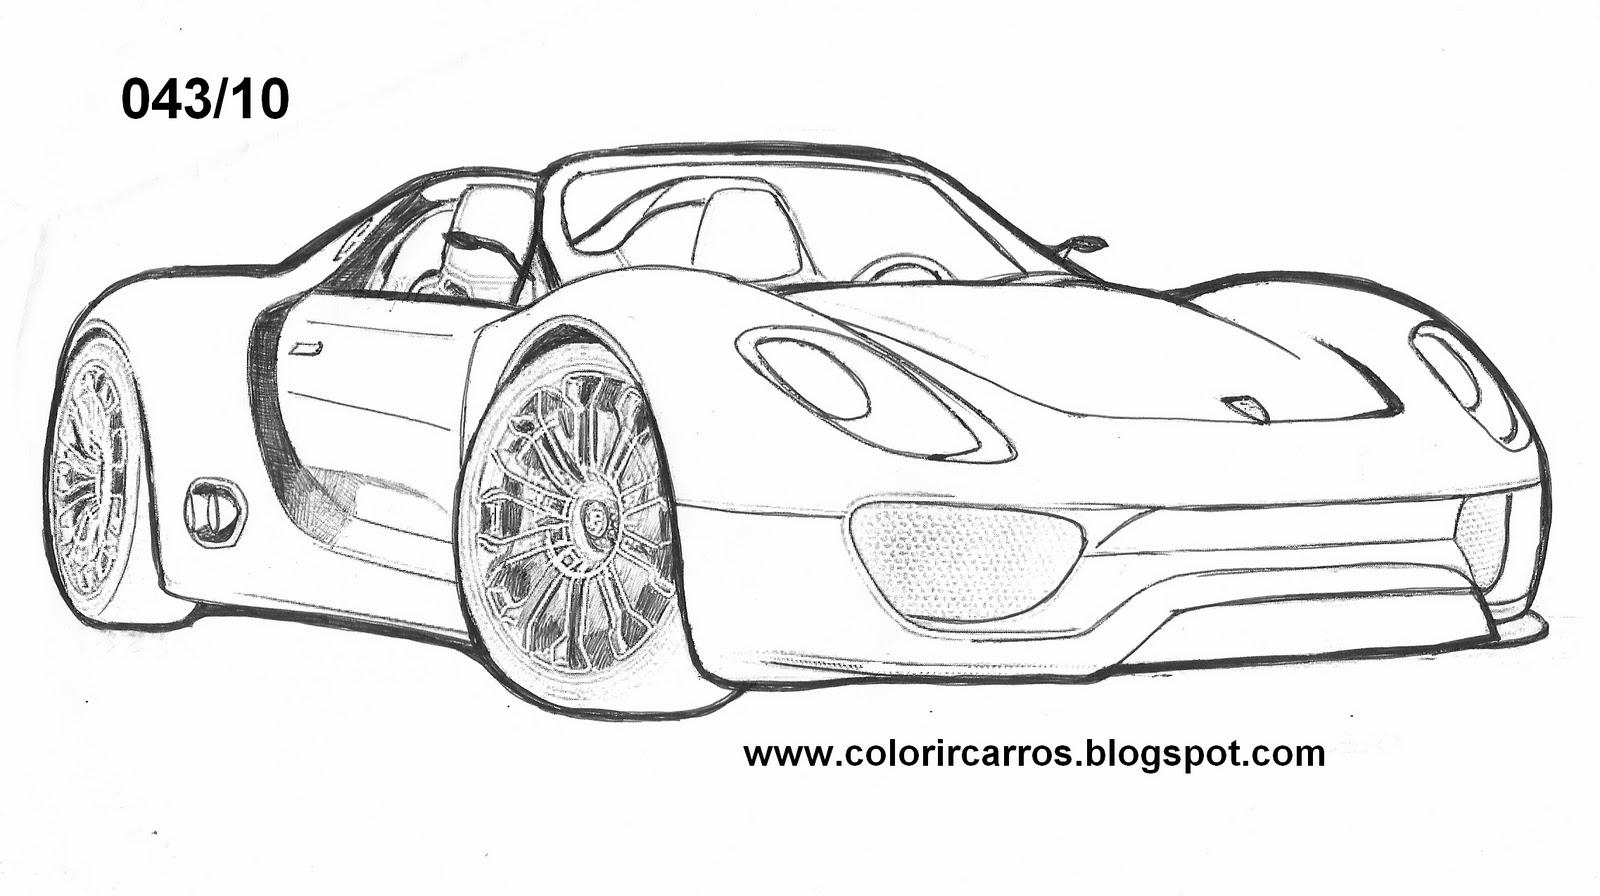 de PROFESSOR ADILSON - colorir carros: Novembro 2010